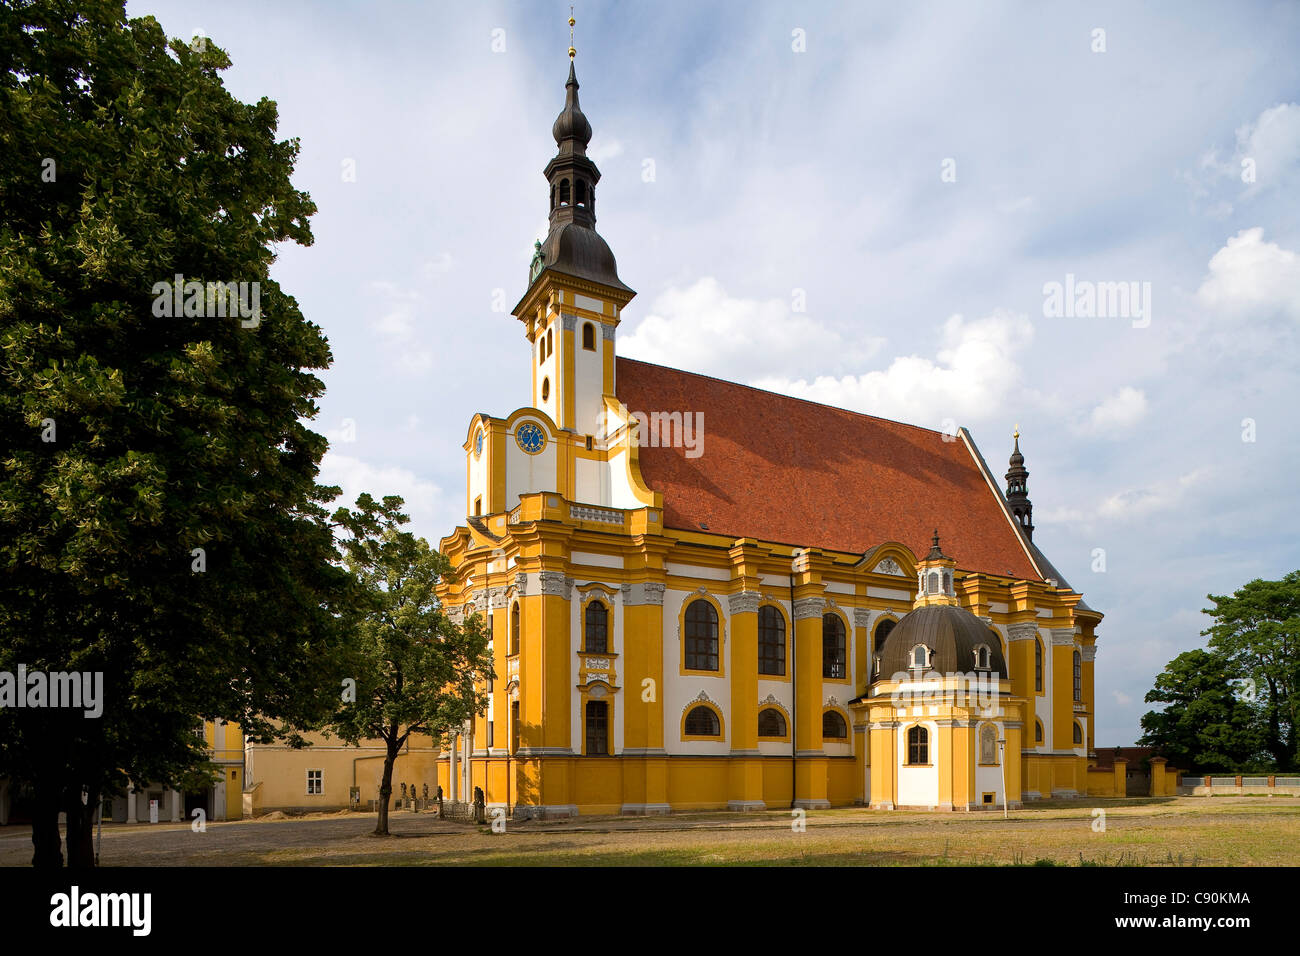 Church of Neuzelle monastery under clouded sky Cistercian monastery near Eisenhuettenstadt Niederlausitz Brandenburg - Stock Image